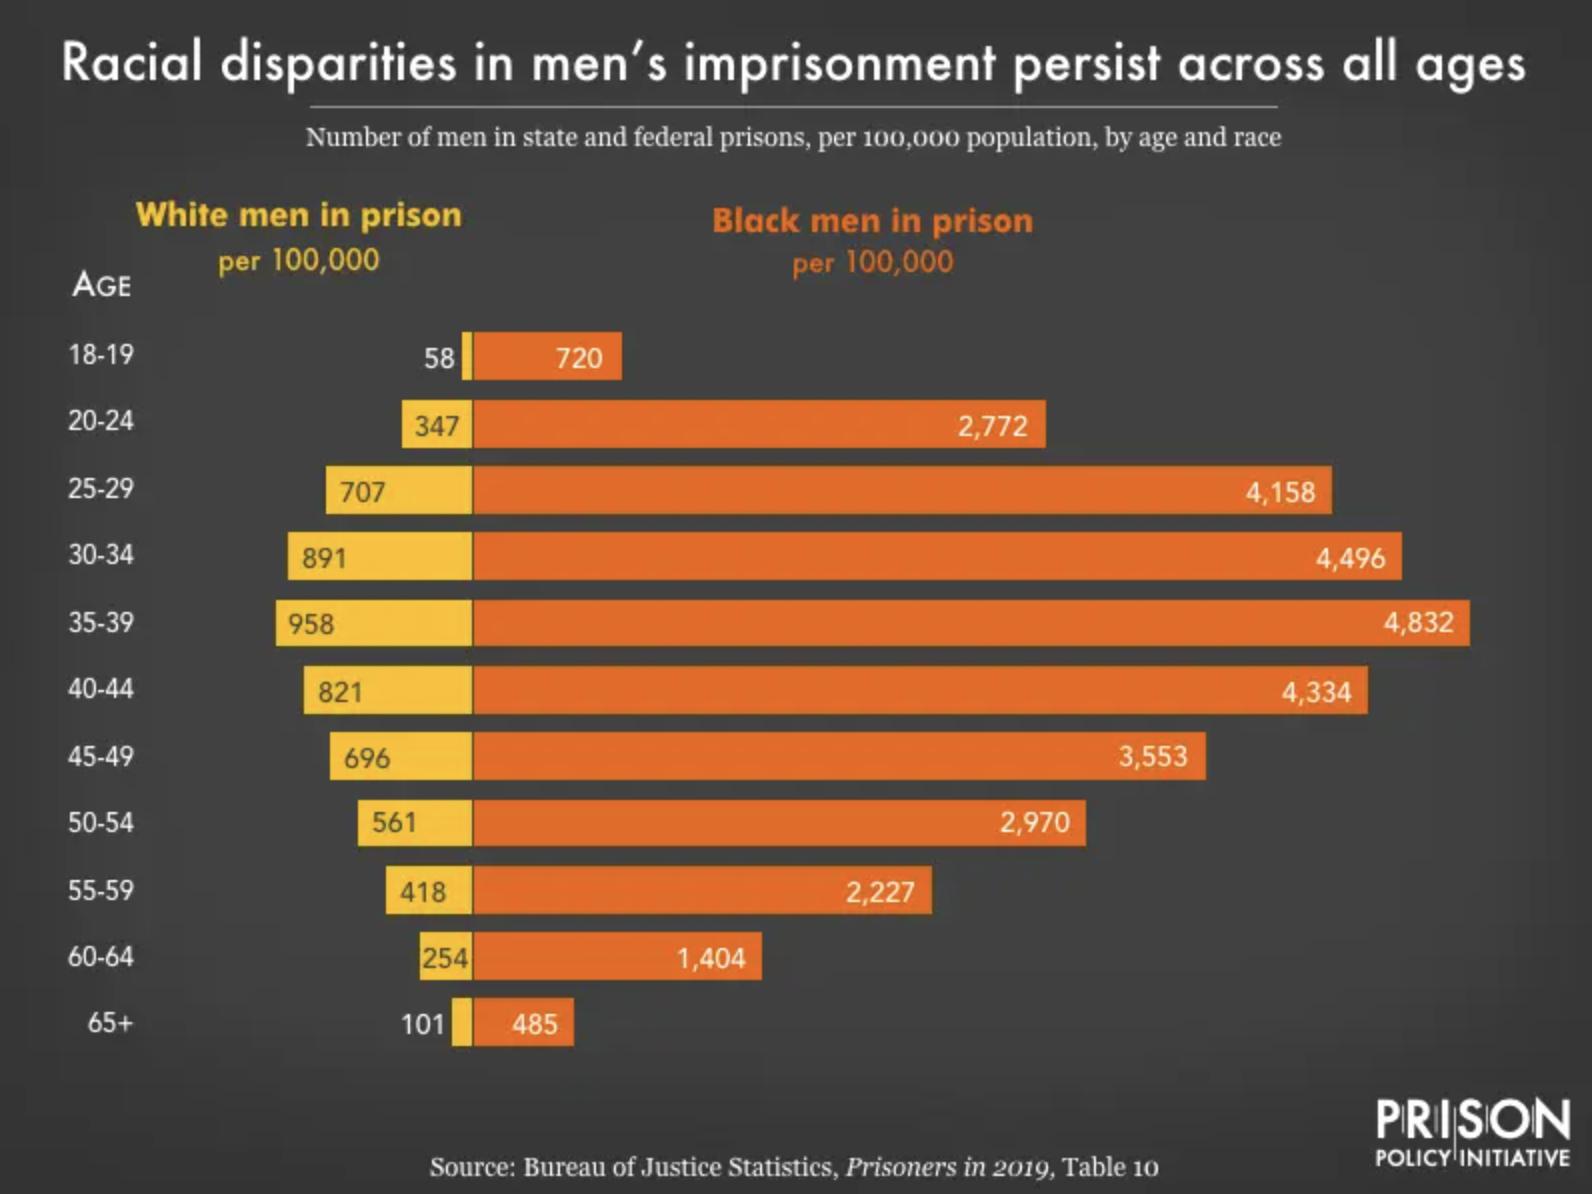 Racial disparities in imprisonment